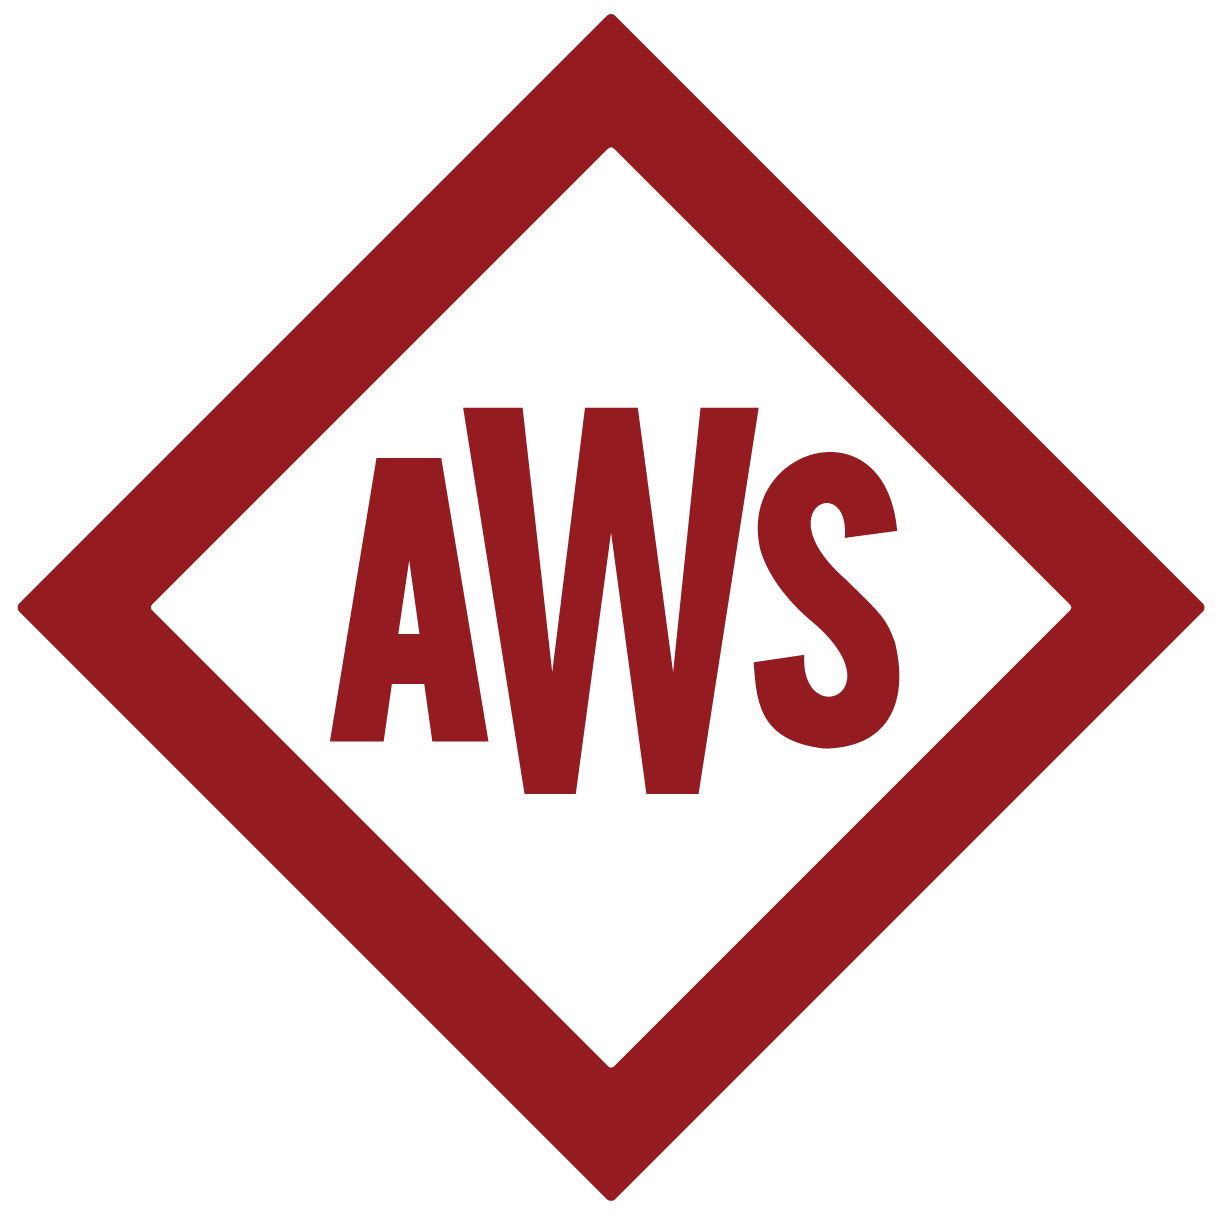 Professional Credential: AWS Member